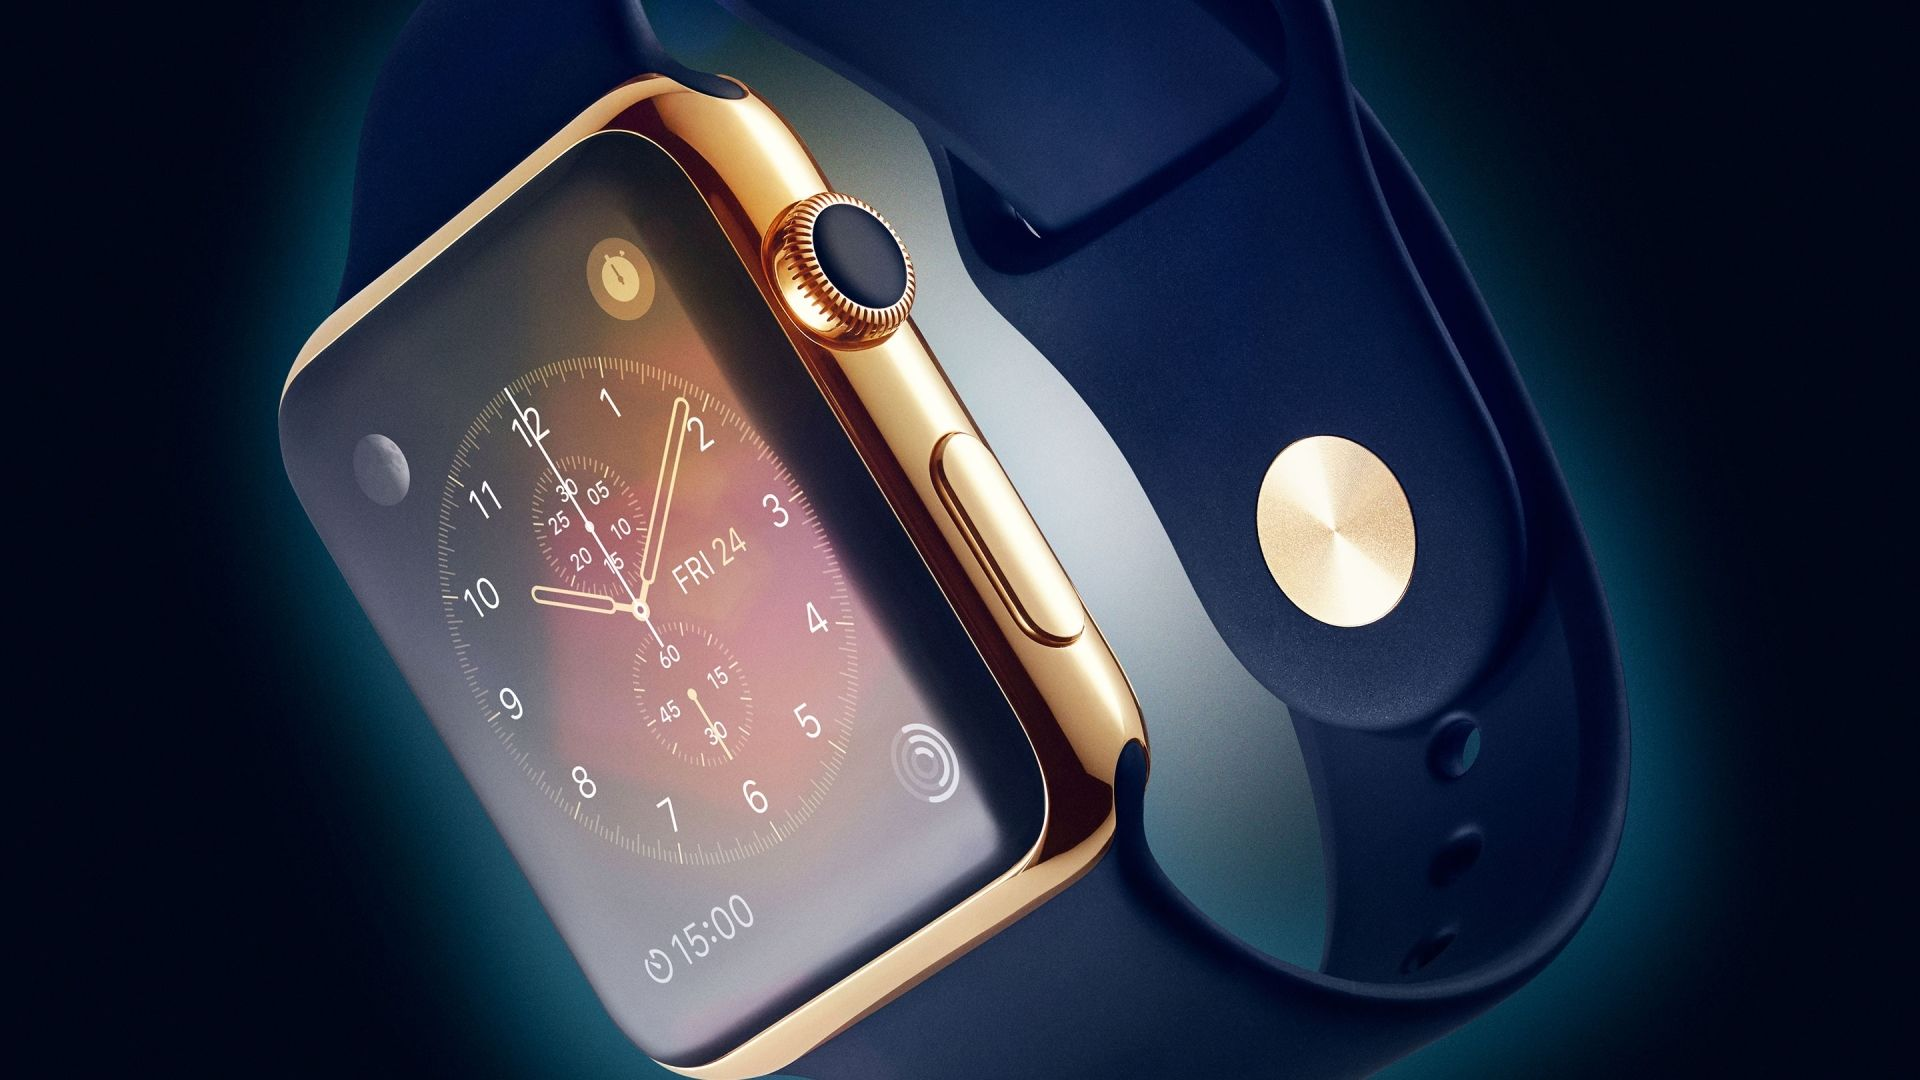 Smartwatch wallpaper download